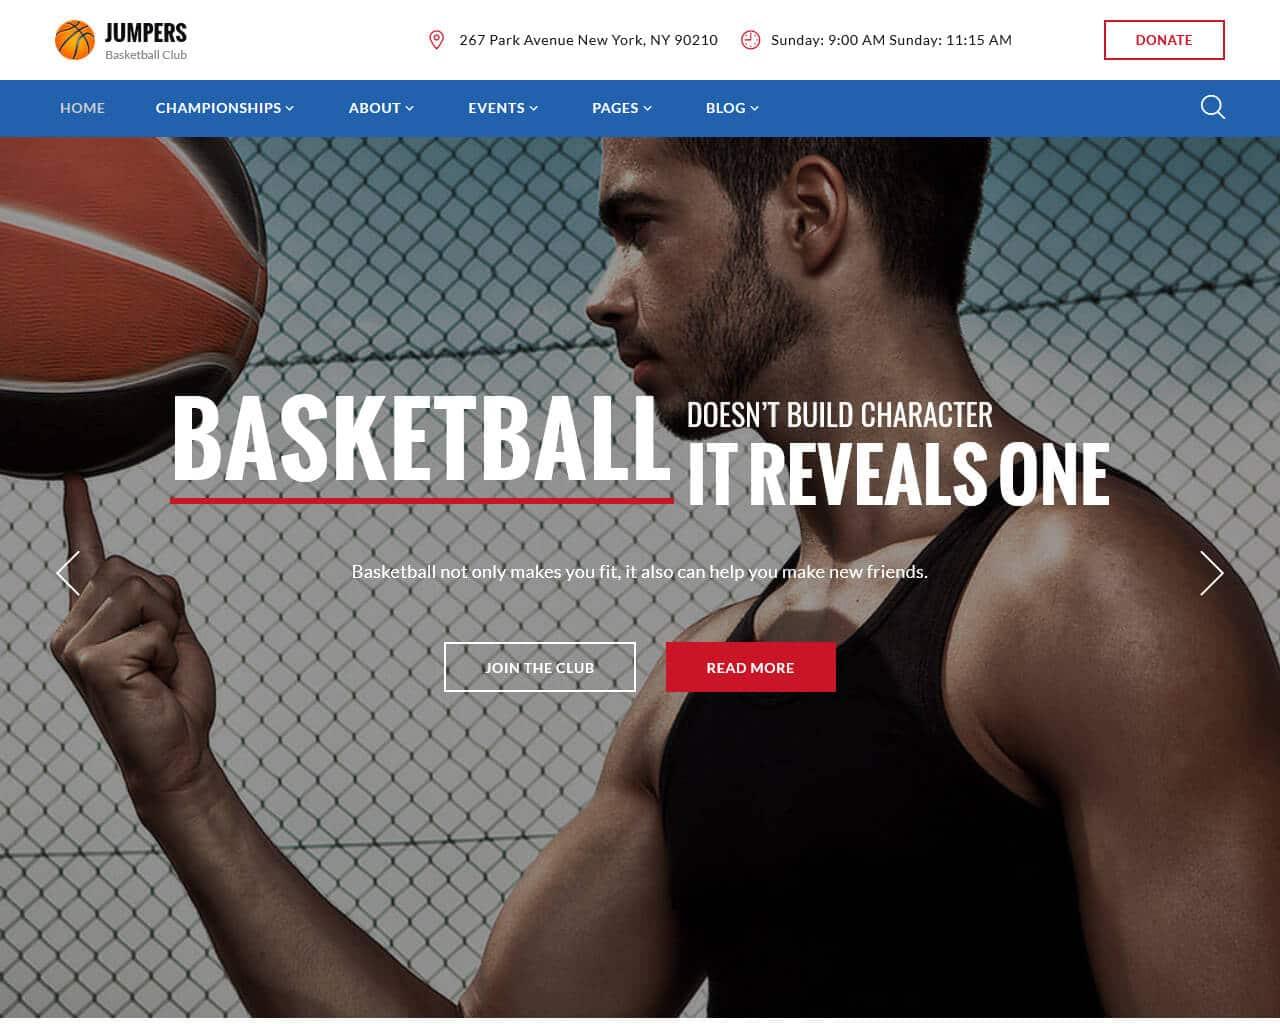 Jumpers Website Template